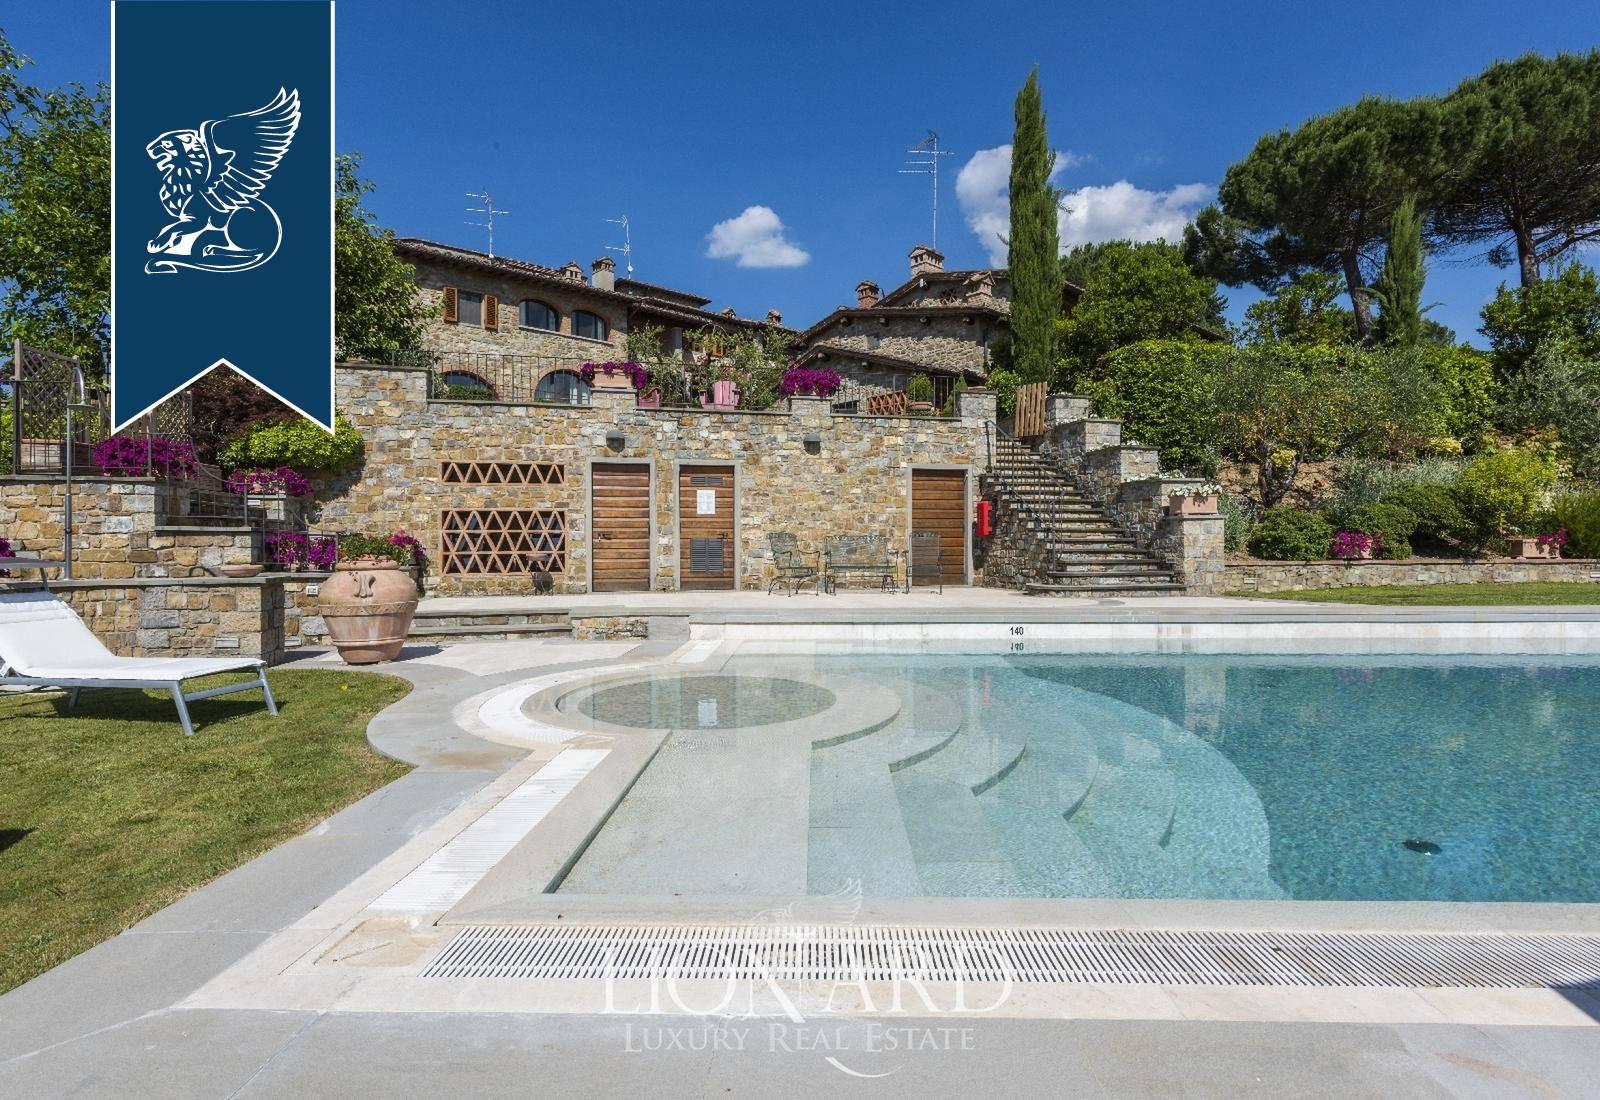 Villa in Vendita a Greve In Chianti: 0 locali, 440 mq - Foto 4